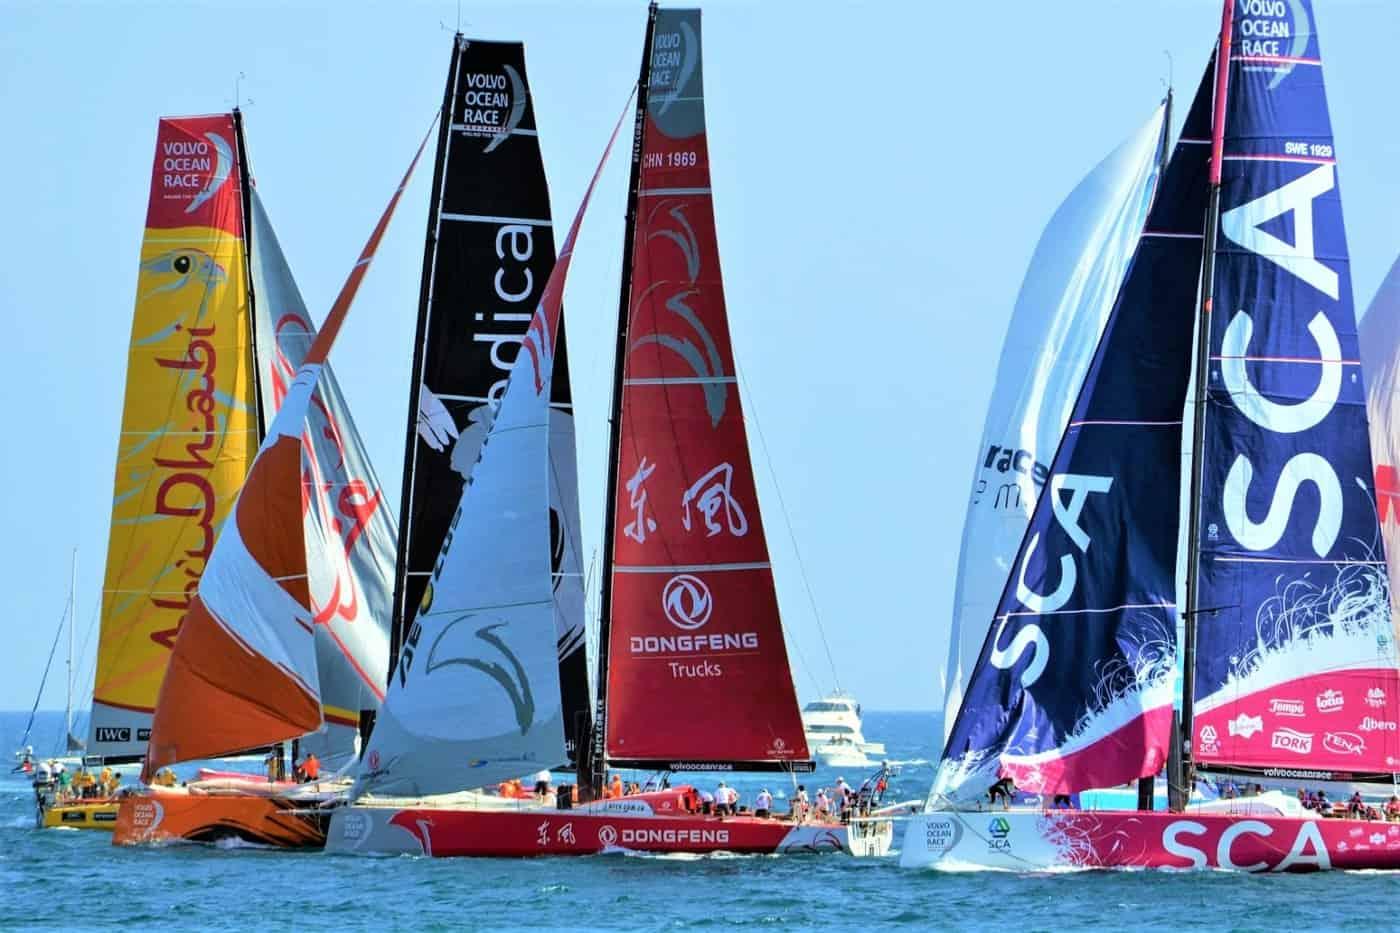 , Marseille veut accueillir la plus grande course de voile de l'histoire des JO, Made in Marseille, Made in Marseille